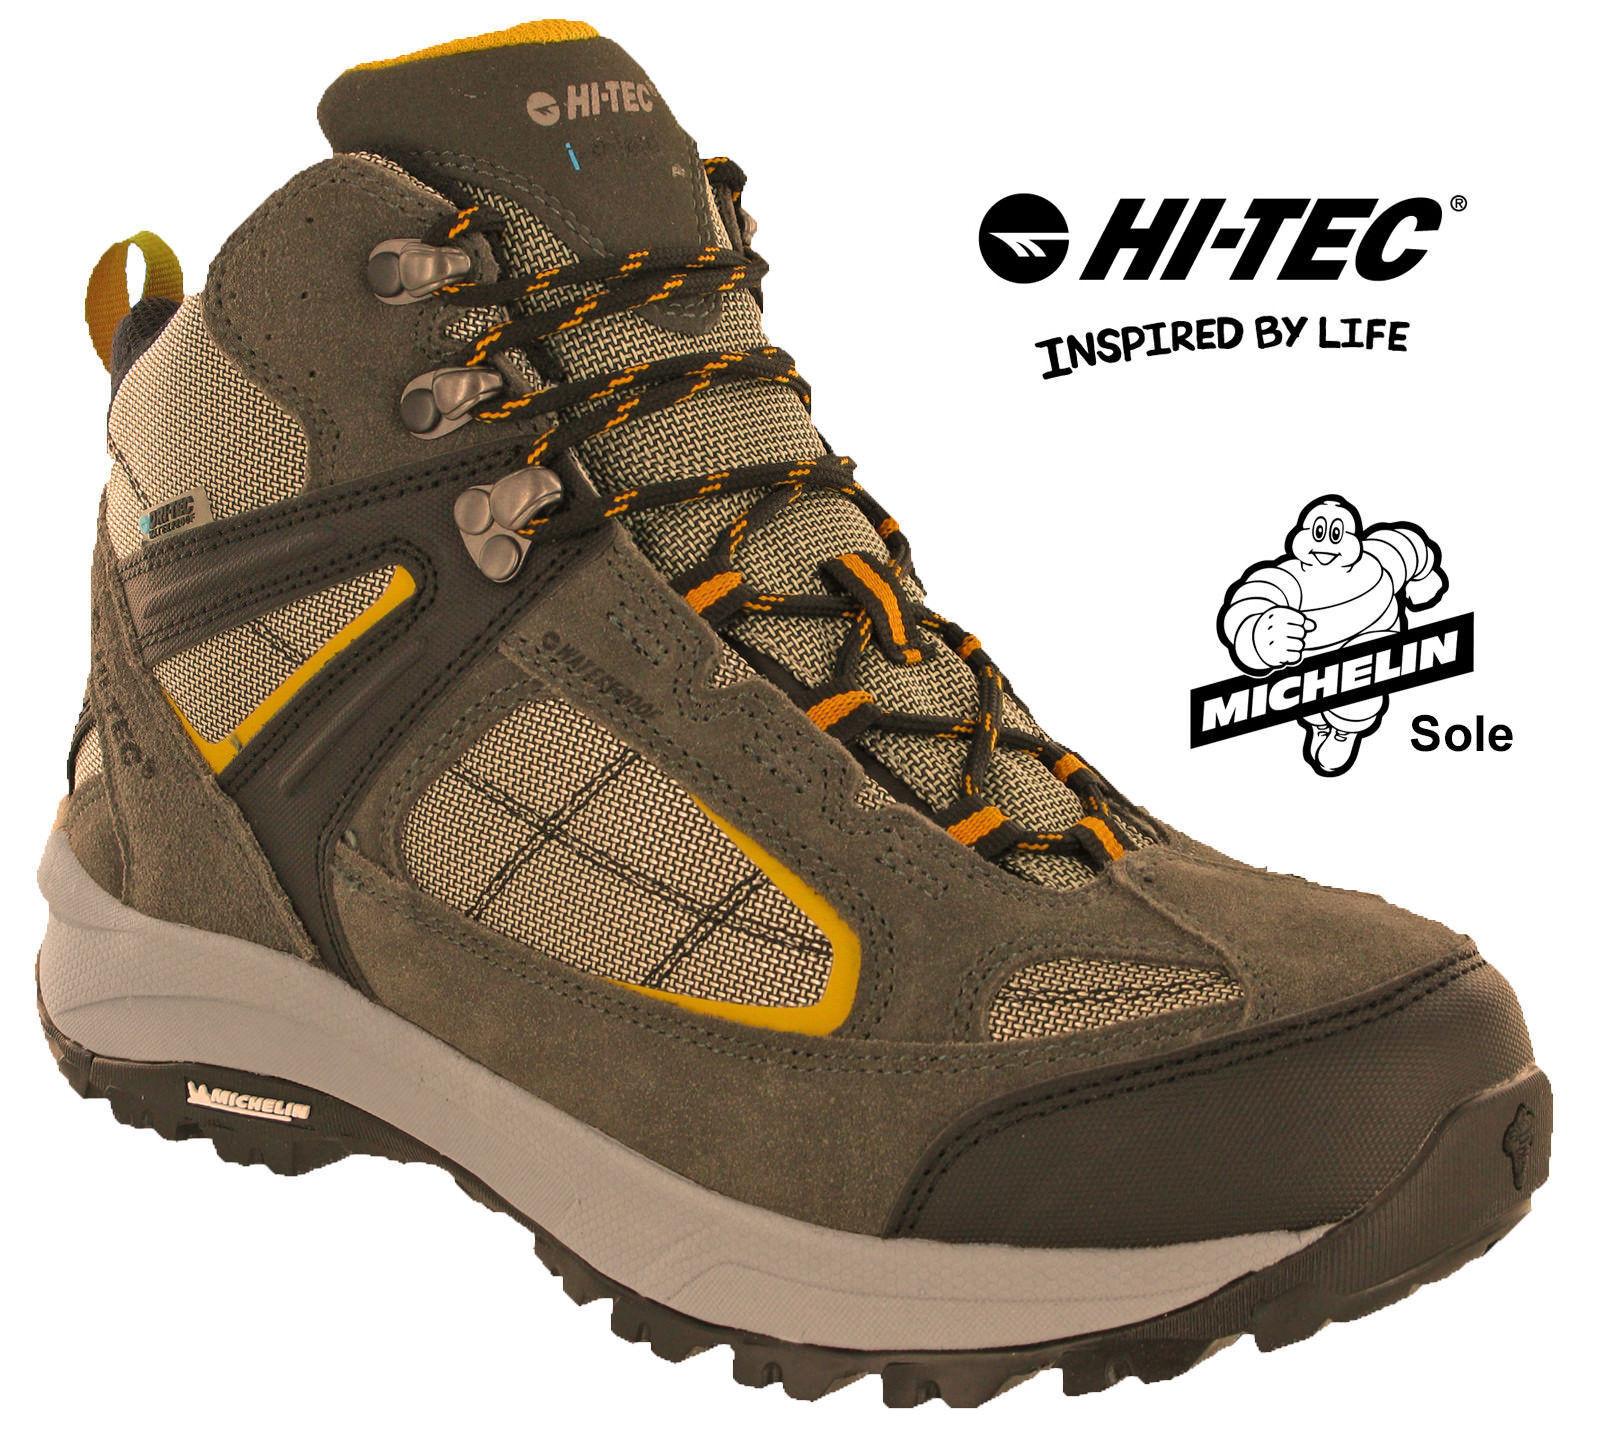 Hitec Hitec Hitec Escursionismo Stivali Impermeabili Altitudine VI Michelin da Pizzo 712 066